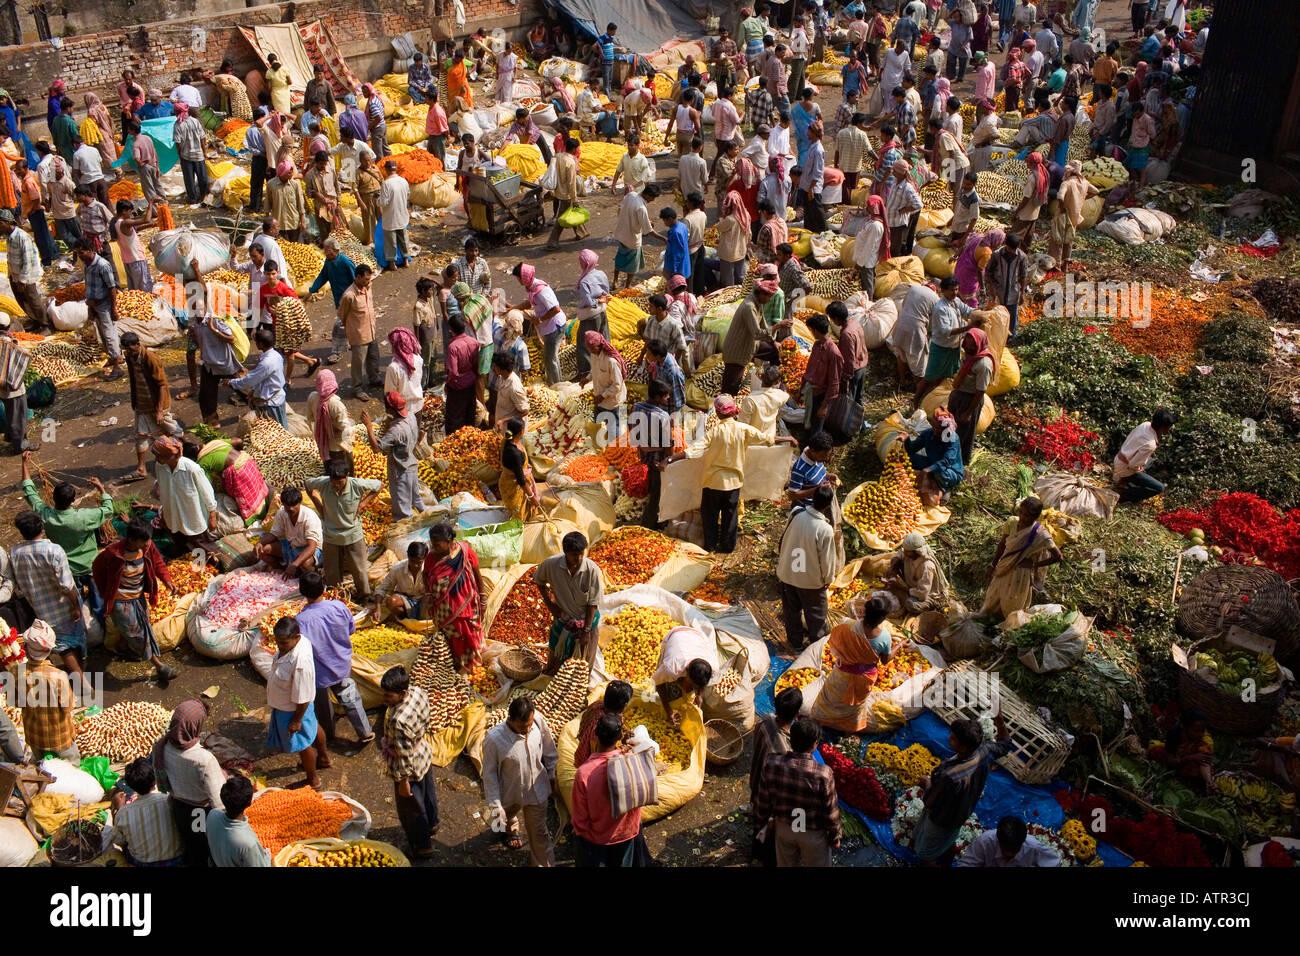 A Kolkata flower market. - Stock Image